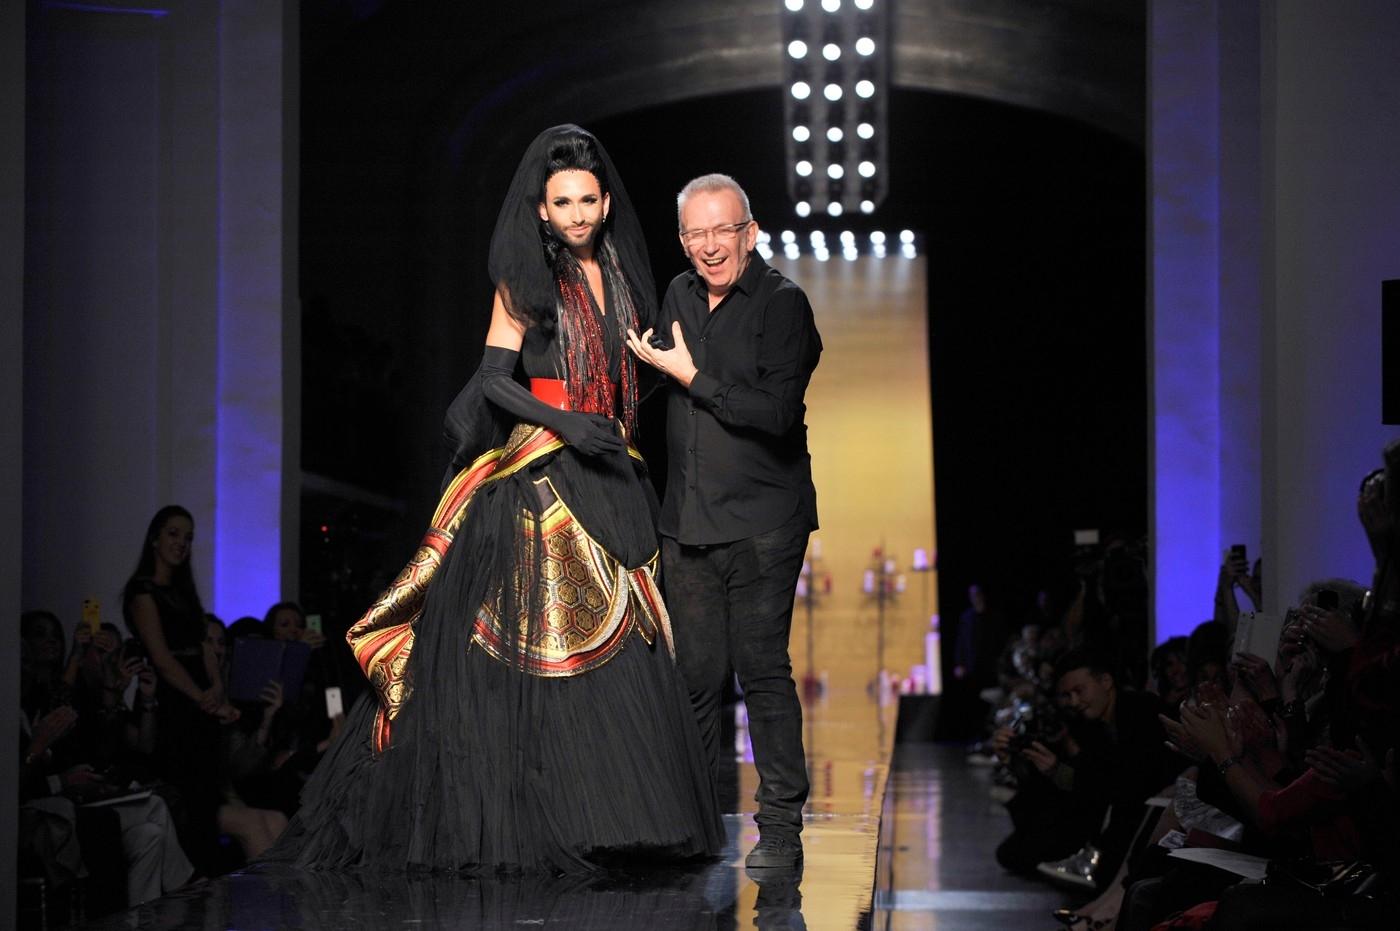 Jean Paul Gaultier showján Conchita volt a sztár